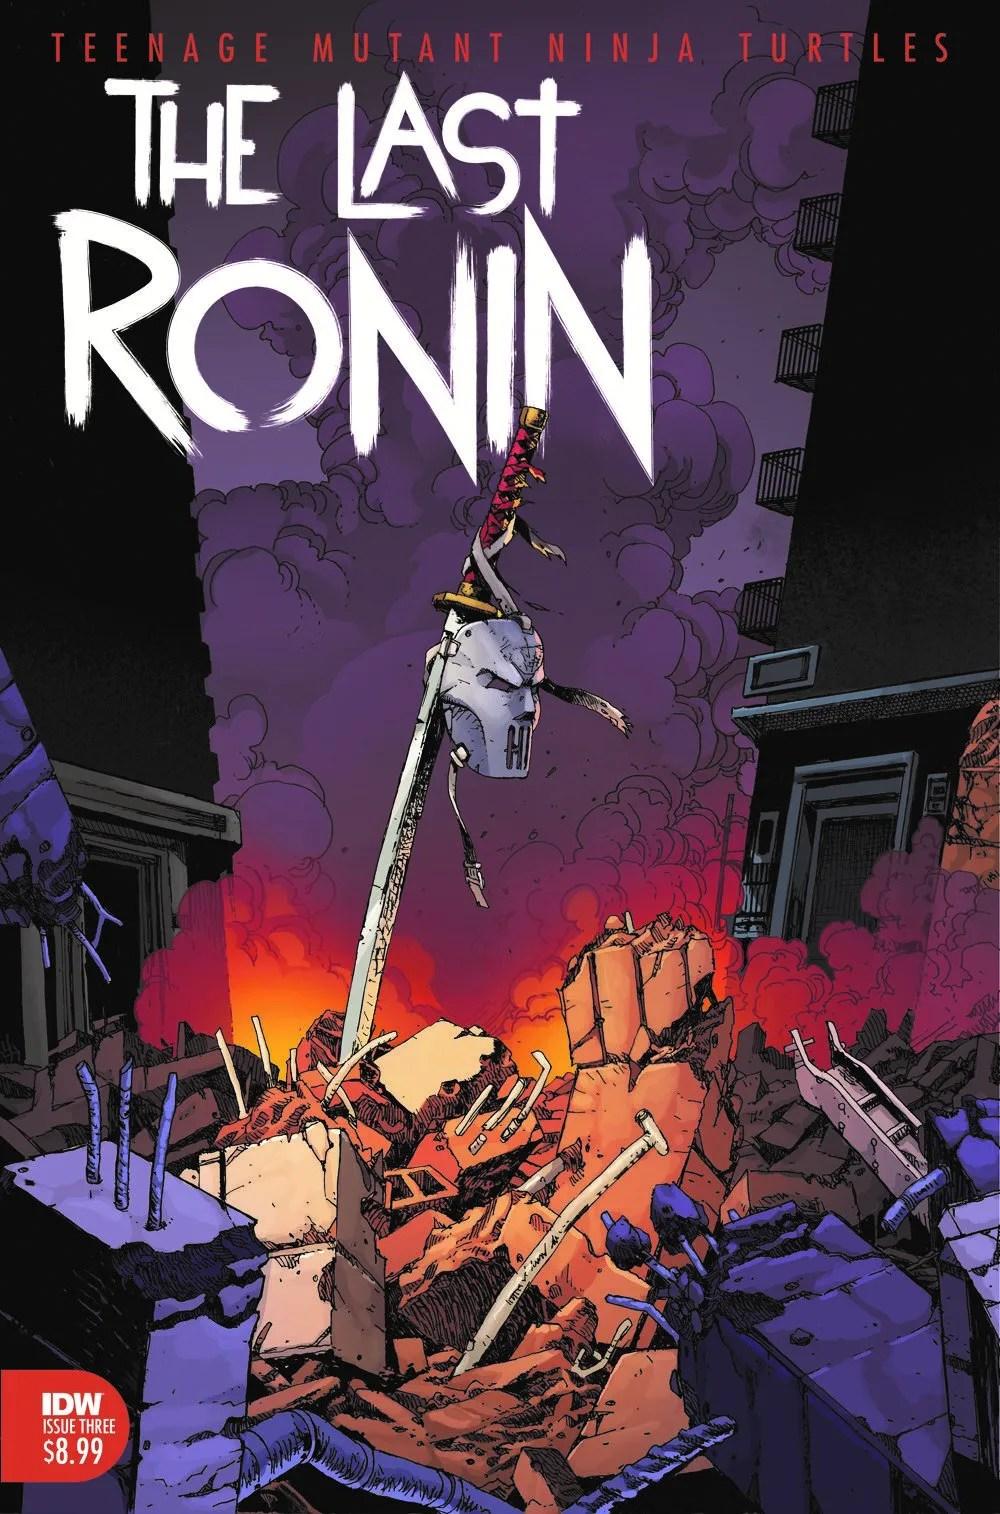 TMNT-LastRonin03_cvrA ComicList Previews: TEENAGE MUTANT NINJA TURTLES THE LAST RONIN #3 (OF 5)